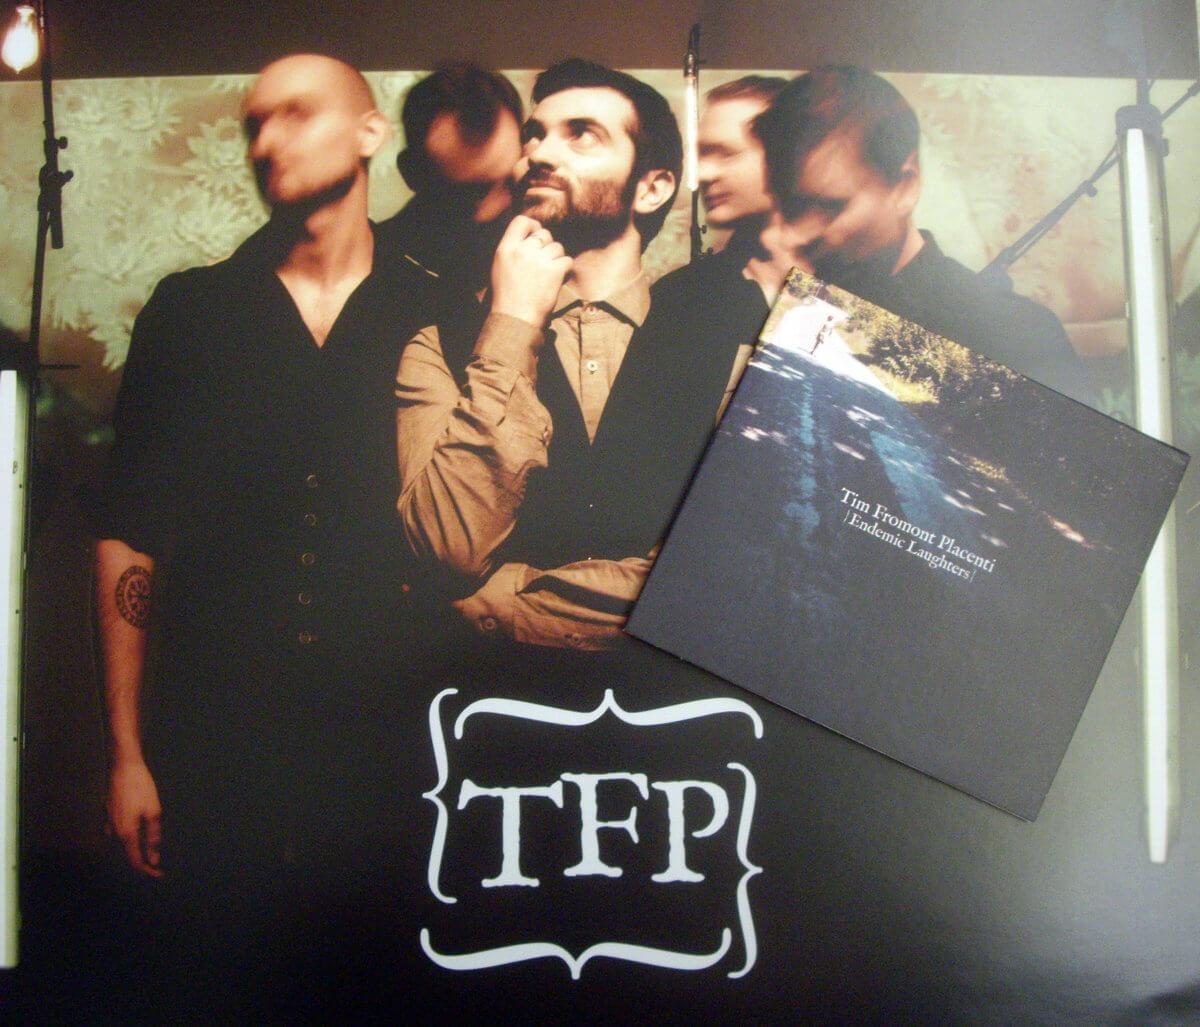 Tim Fromont Placenti nouvel album Endemic Laughters cacestculte